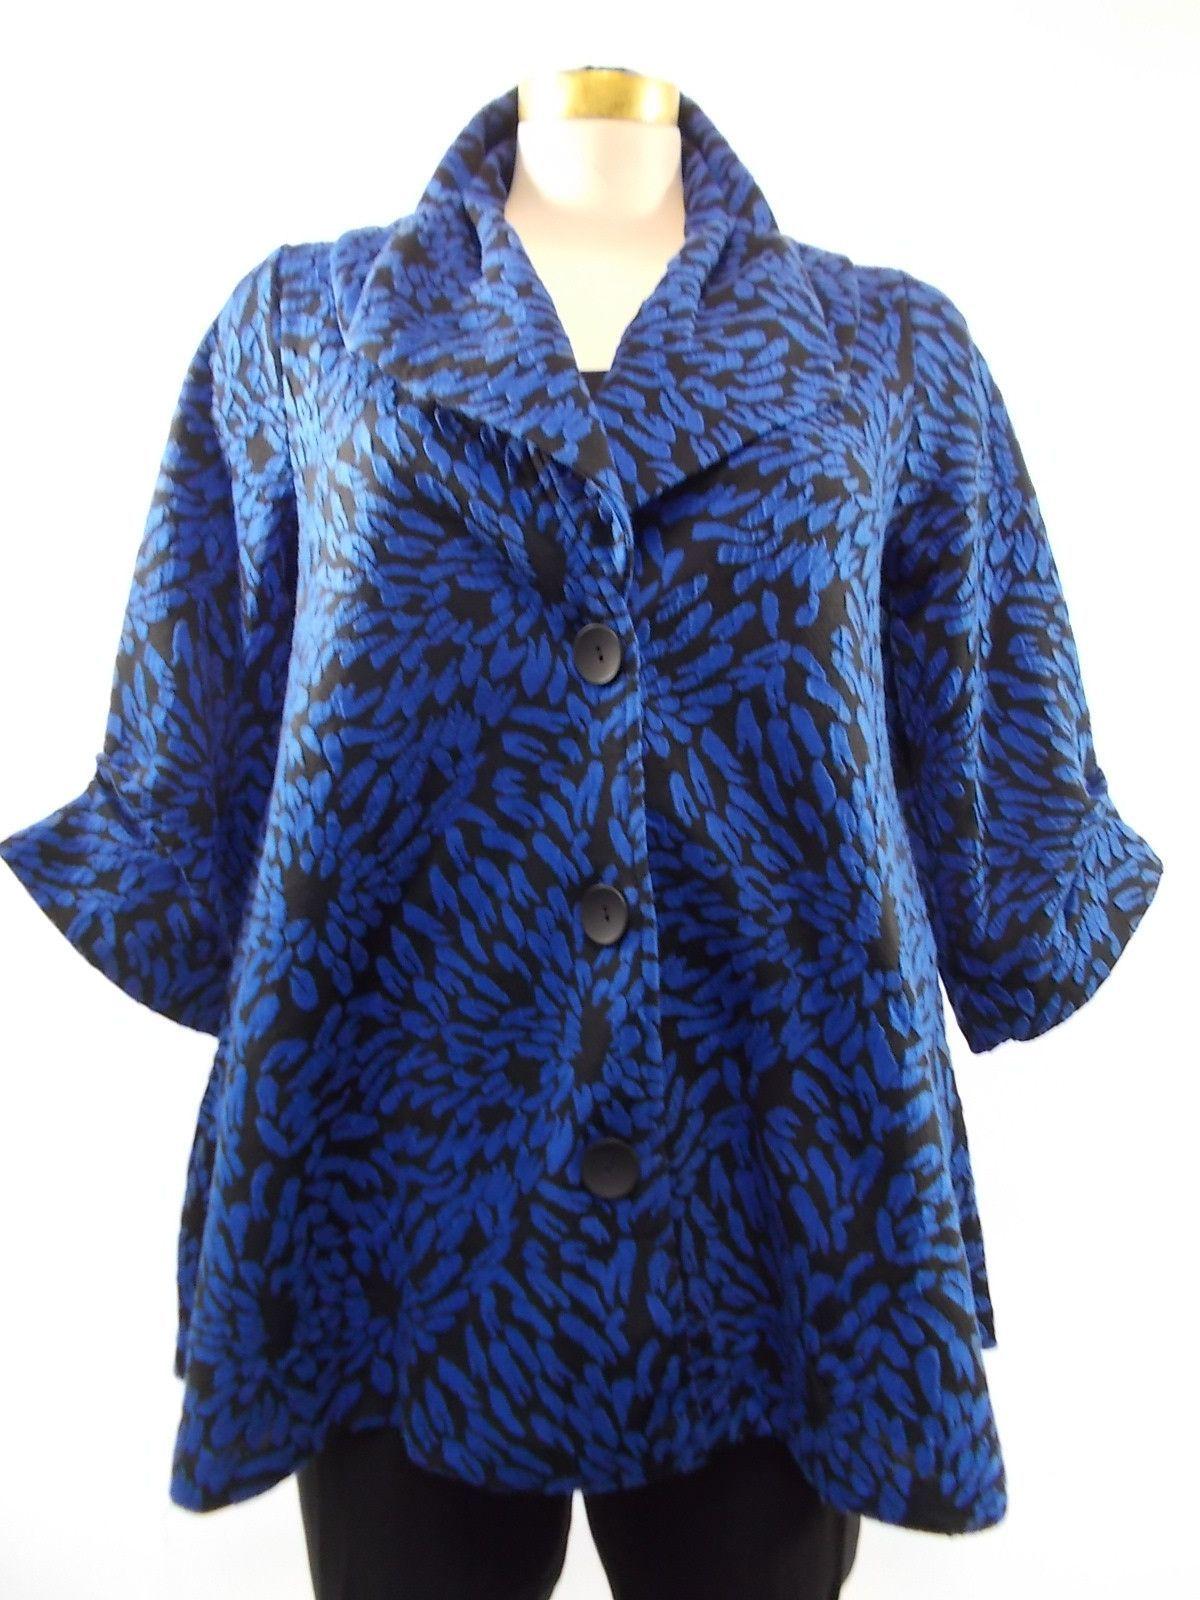 Damee - Black/Blue Chrysanthemum Print Long Jacket